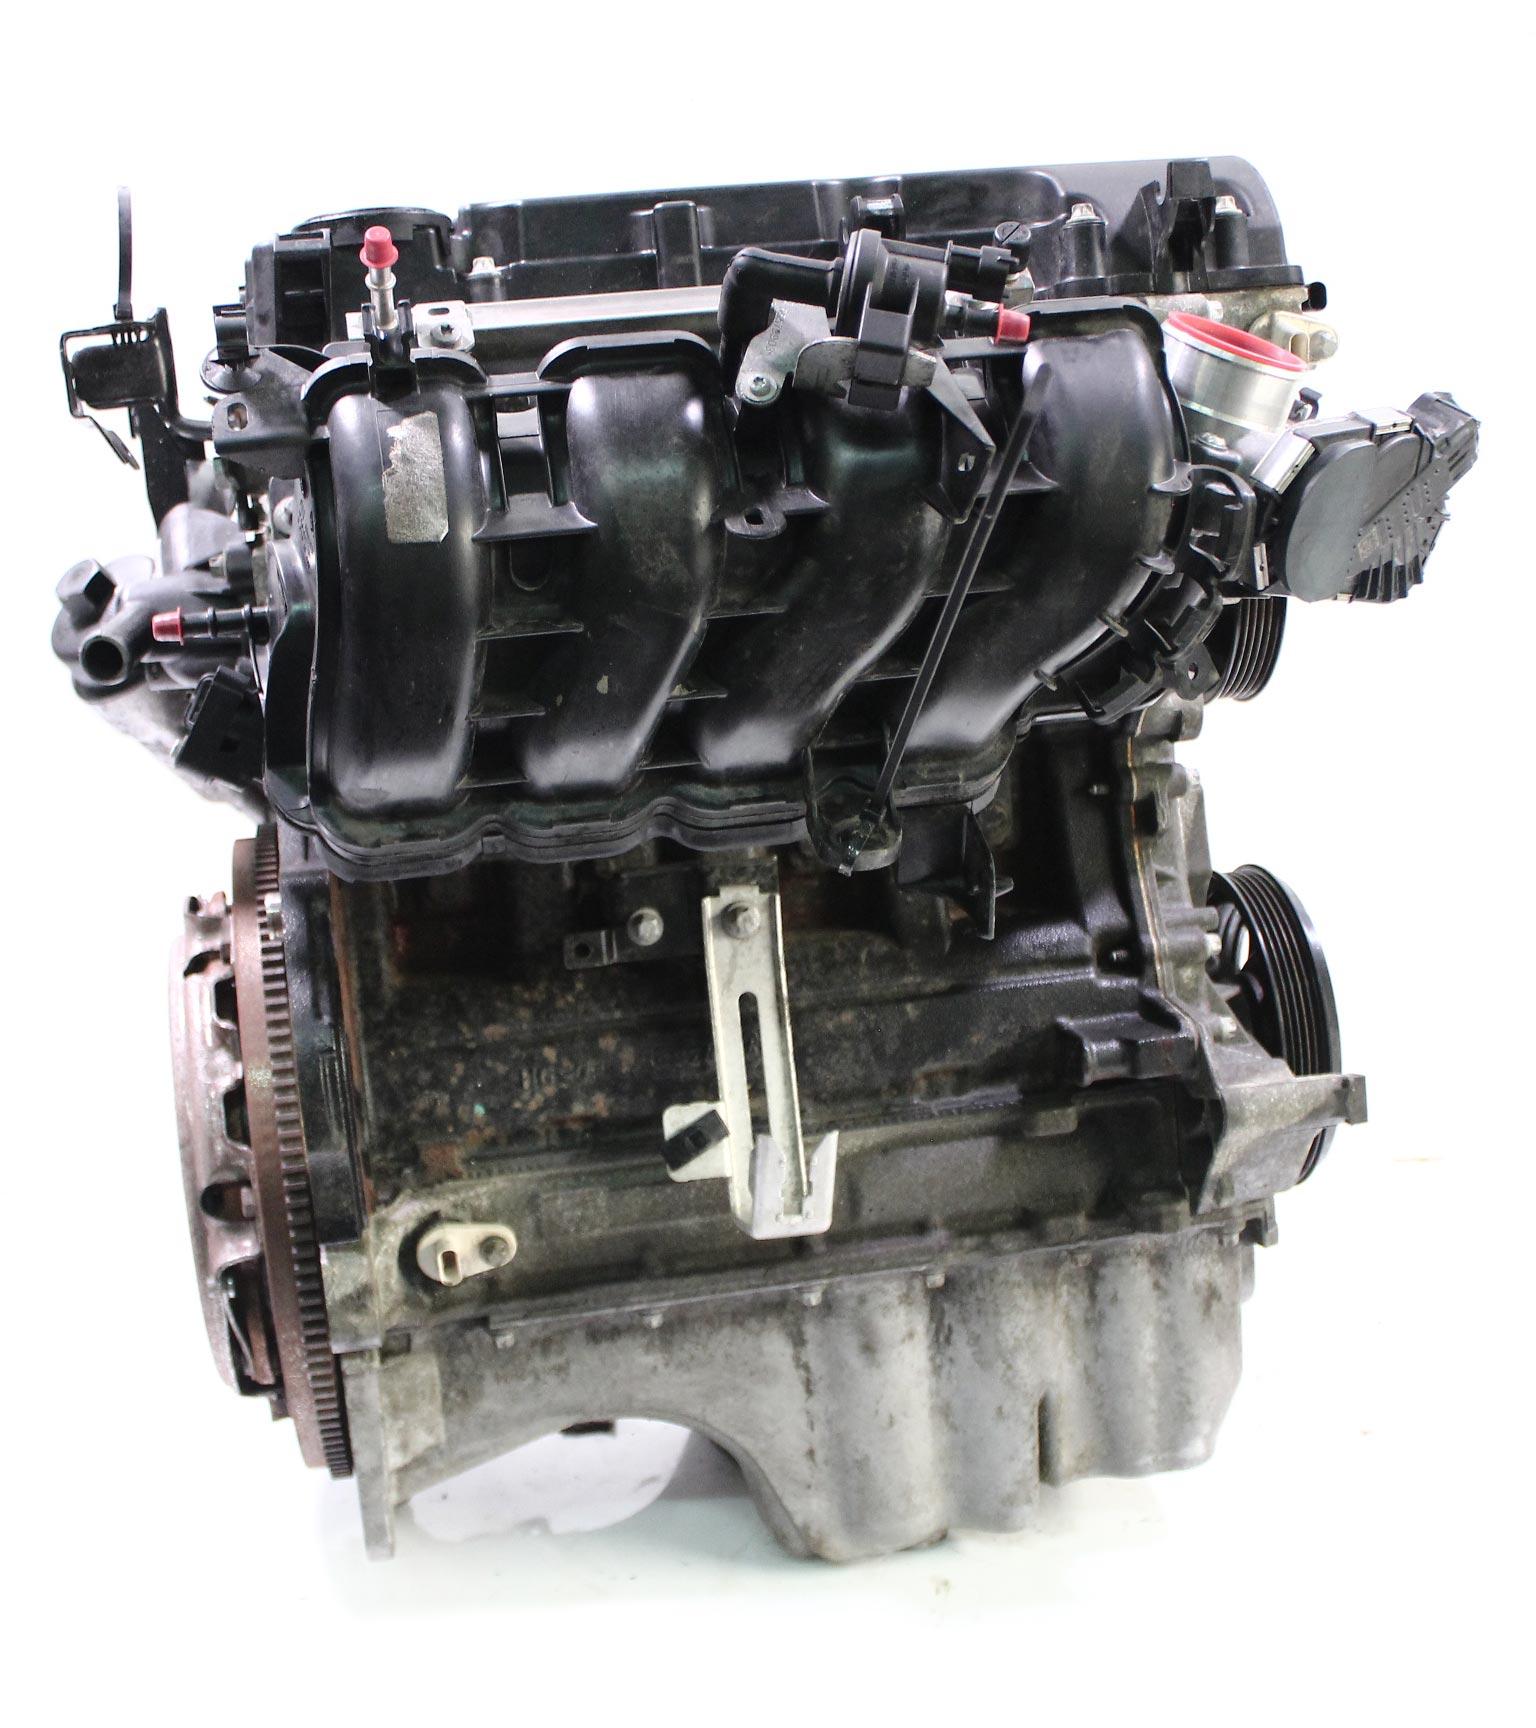 Motor 2015 Opel 1,2 B12XER Baugleich mit: B12XEL